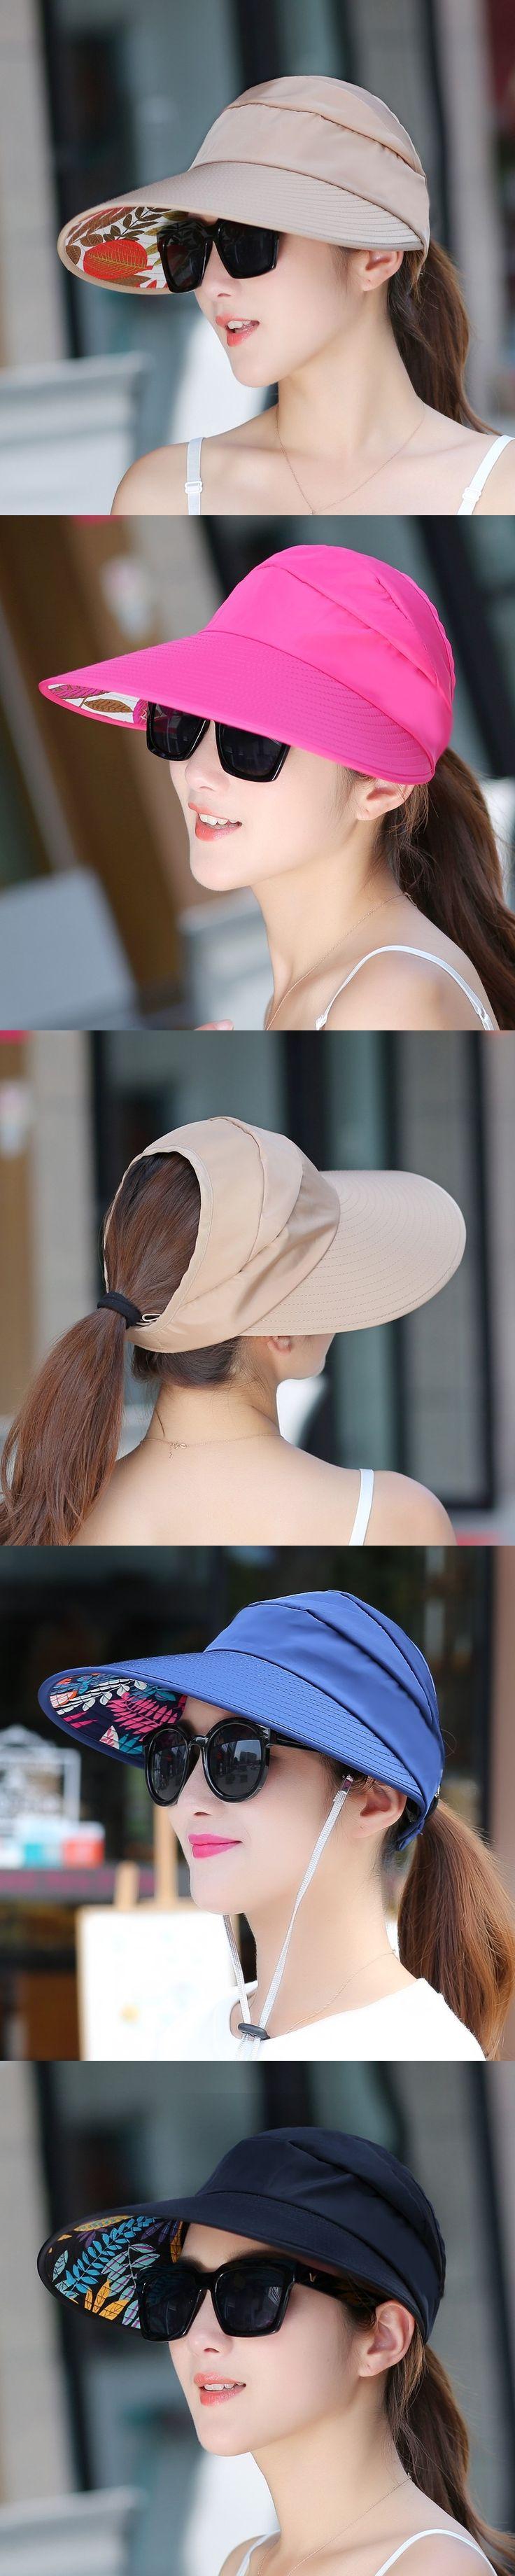 New Summer Girls Foldable Sun Hats Sun Visor Hat Sun Hats for Women With Big Heads Beach Hat UV Protection PL2